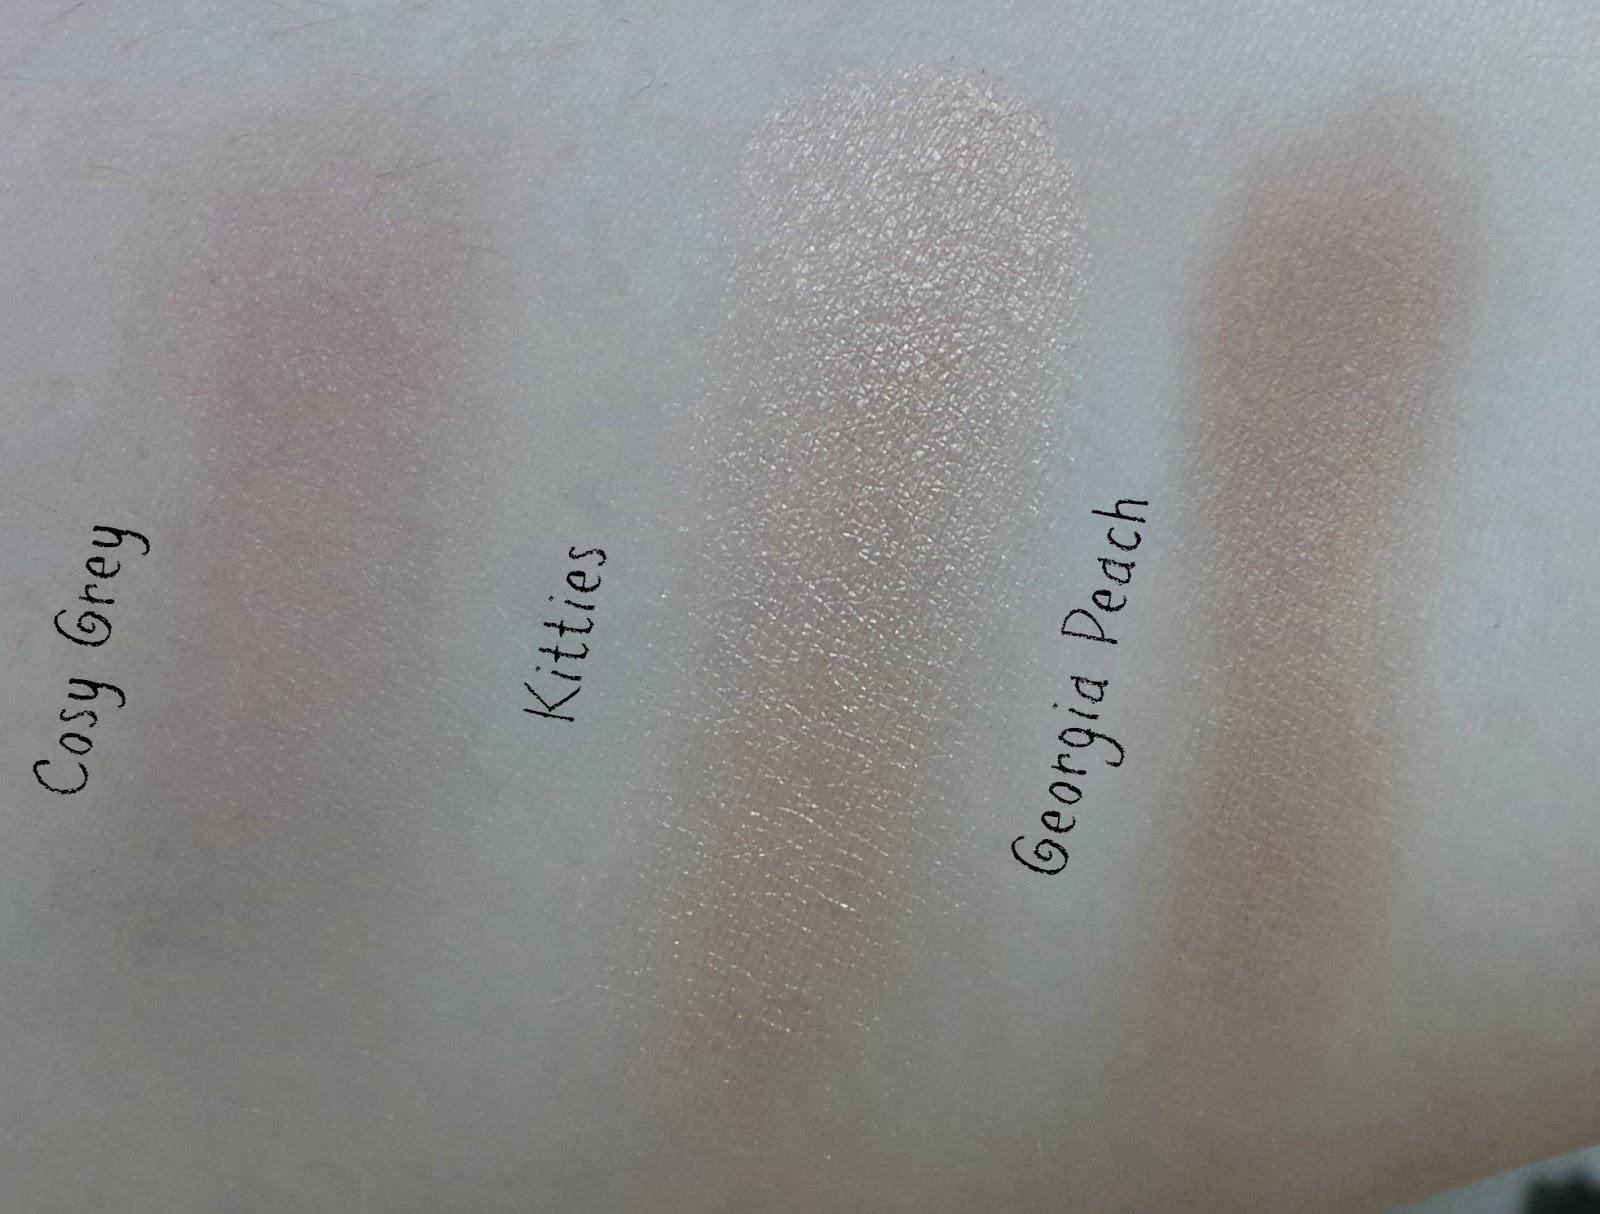 MAC Amber x 9 palette review